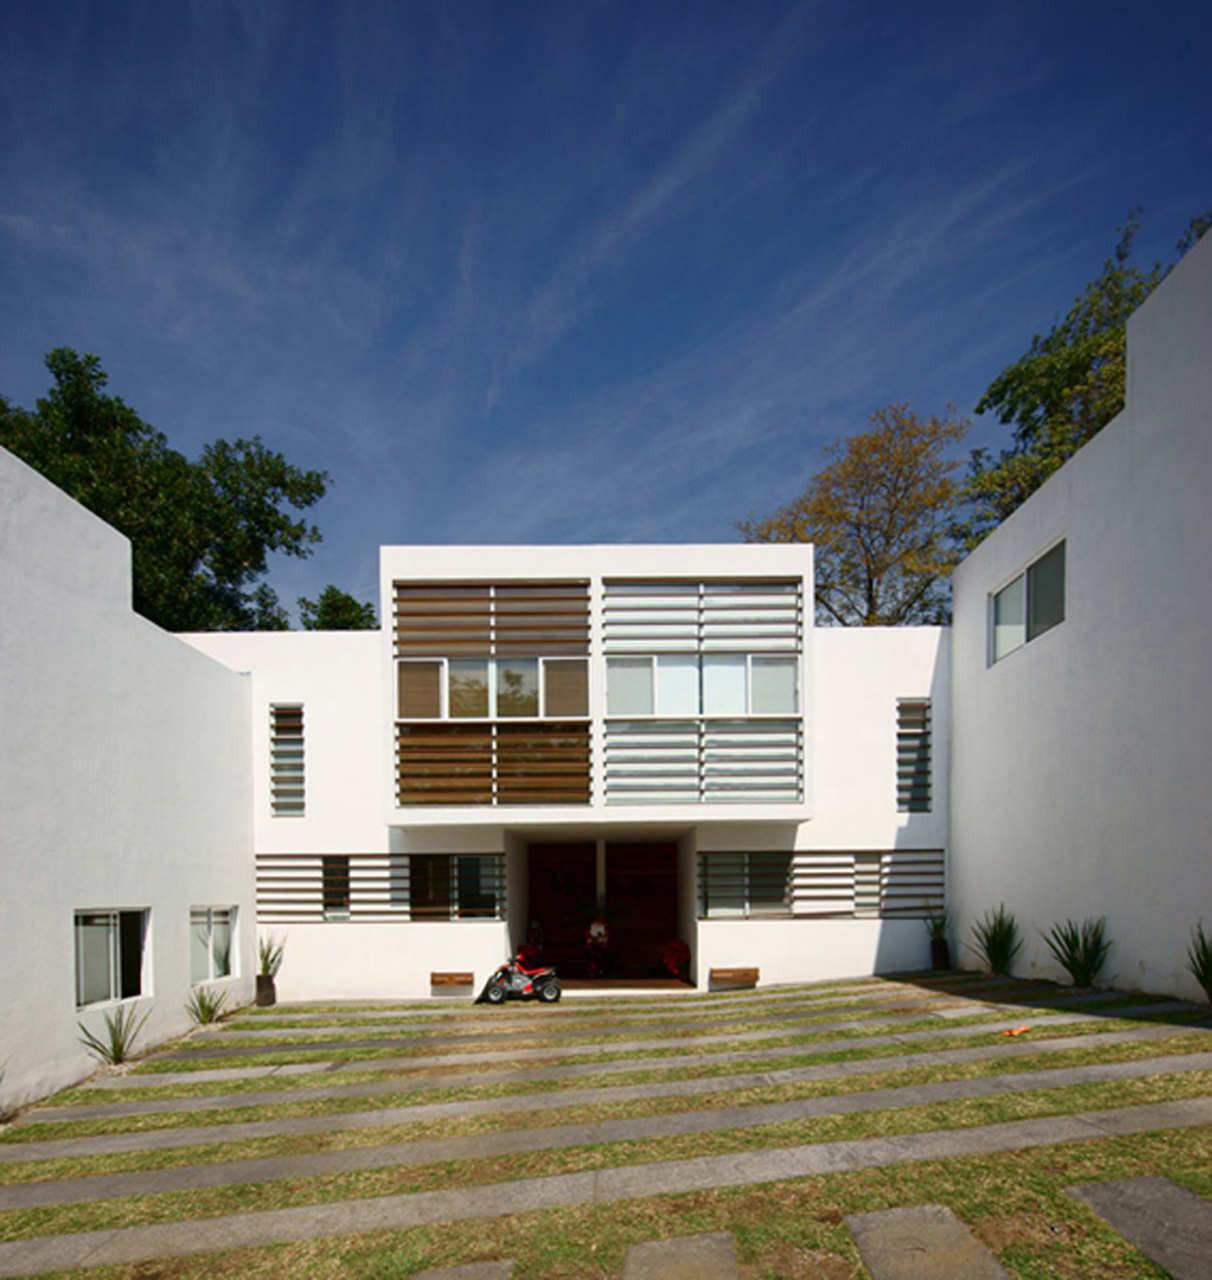 San Juan Houses / Aflo Arquitectos + Serrano Monjaraz Architects, © Marcos Betanzos